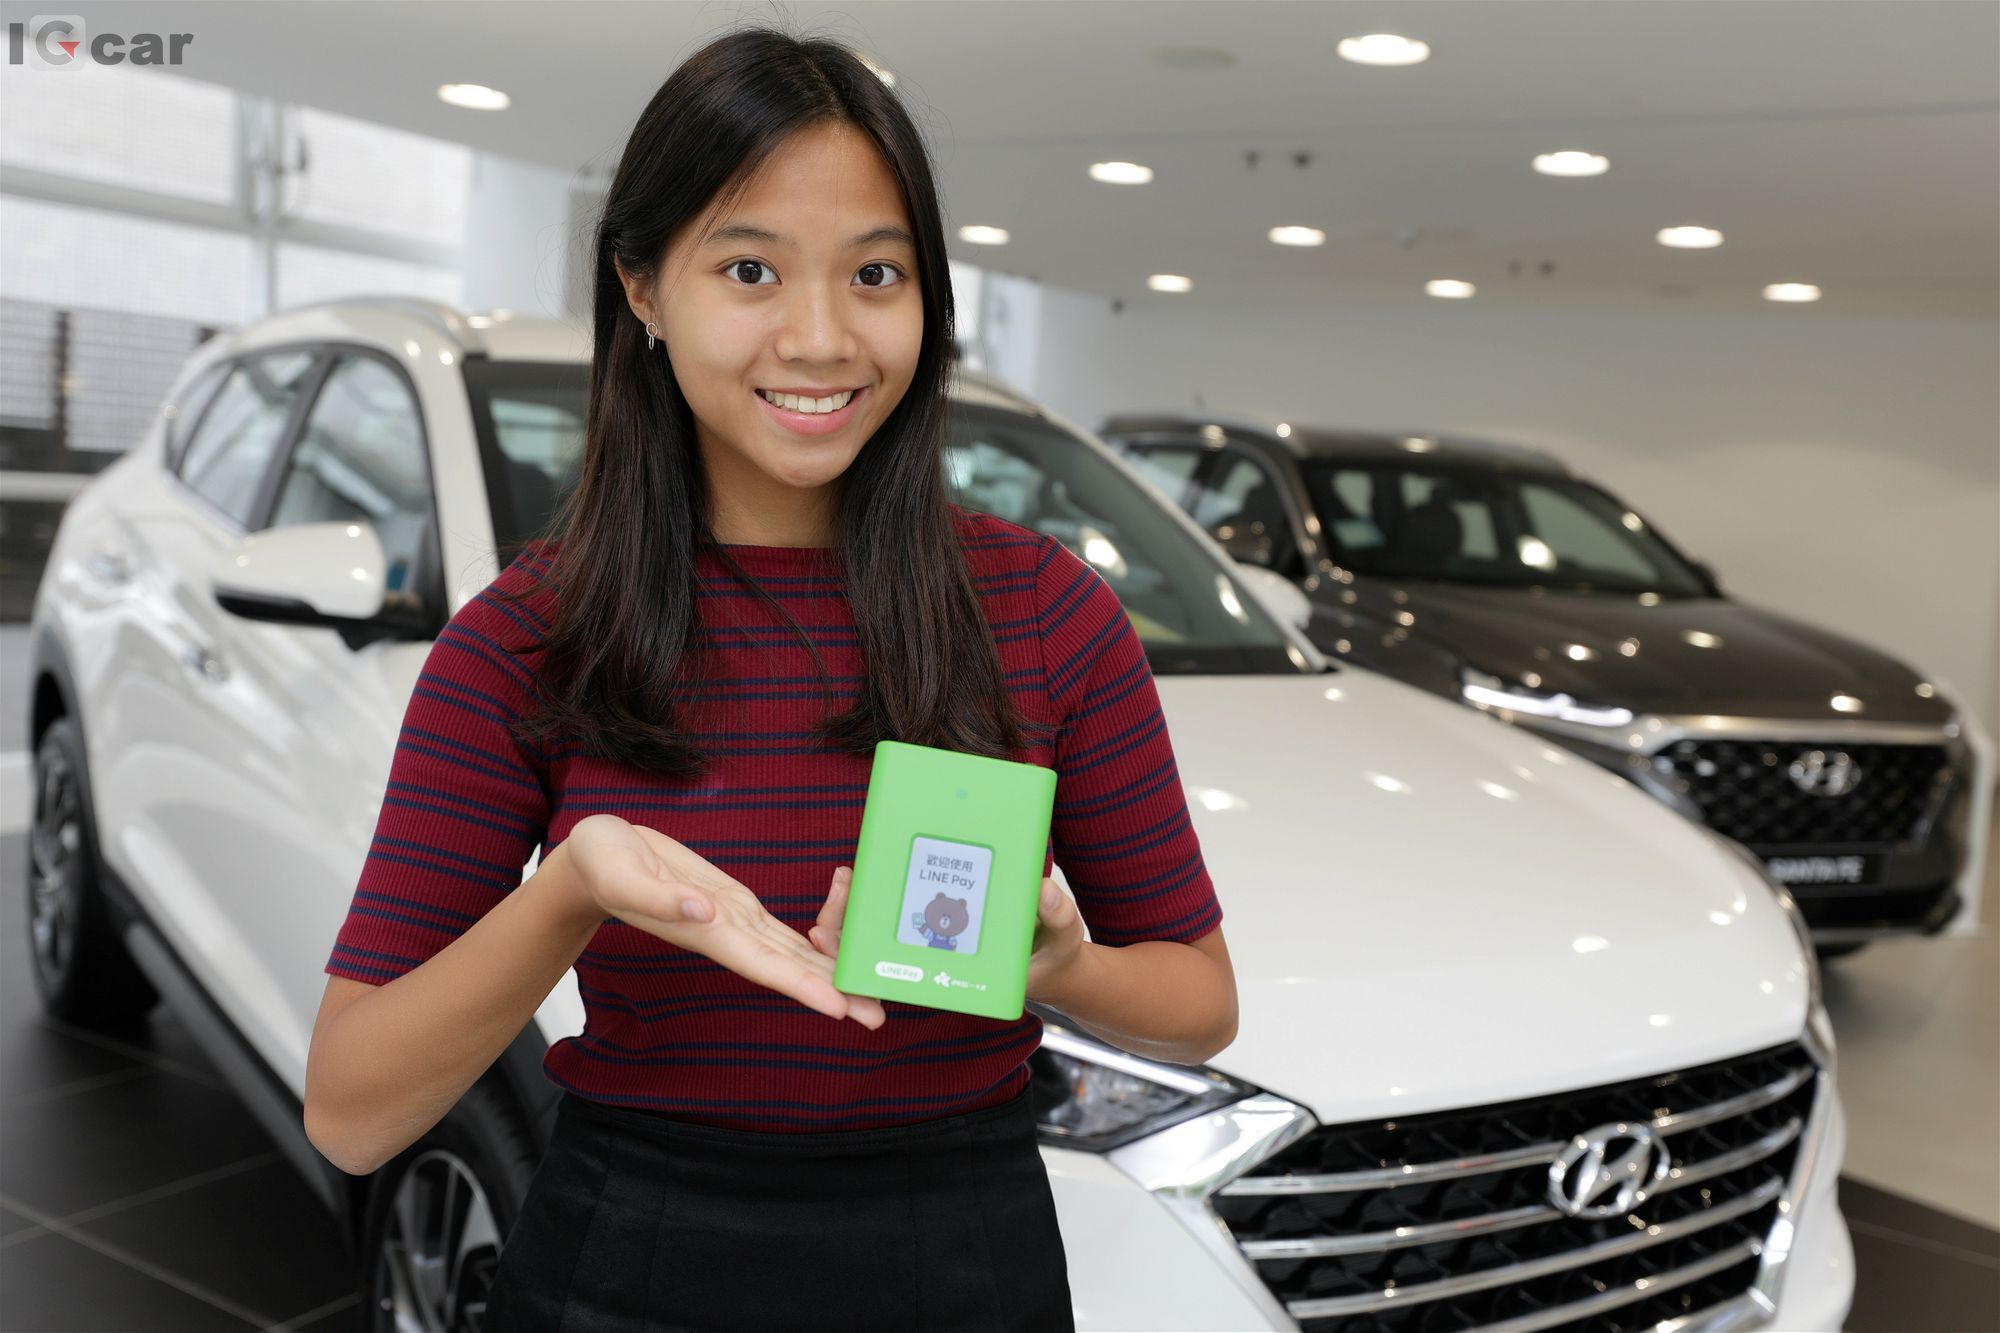 IGcar 愛駒資訊 Hyundai 南陽實業 LINE Pay